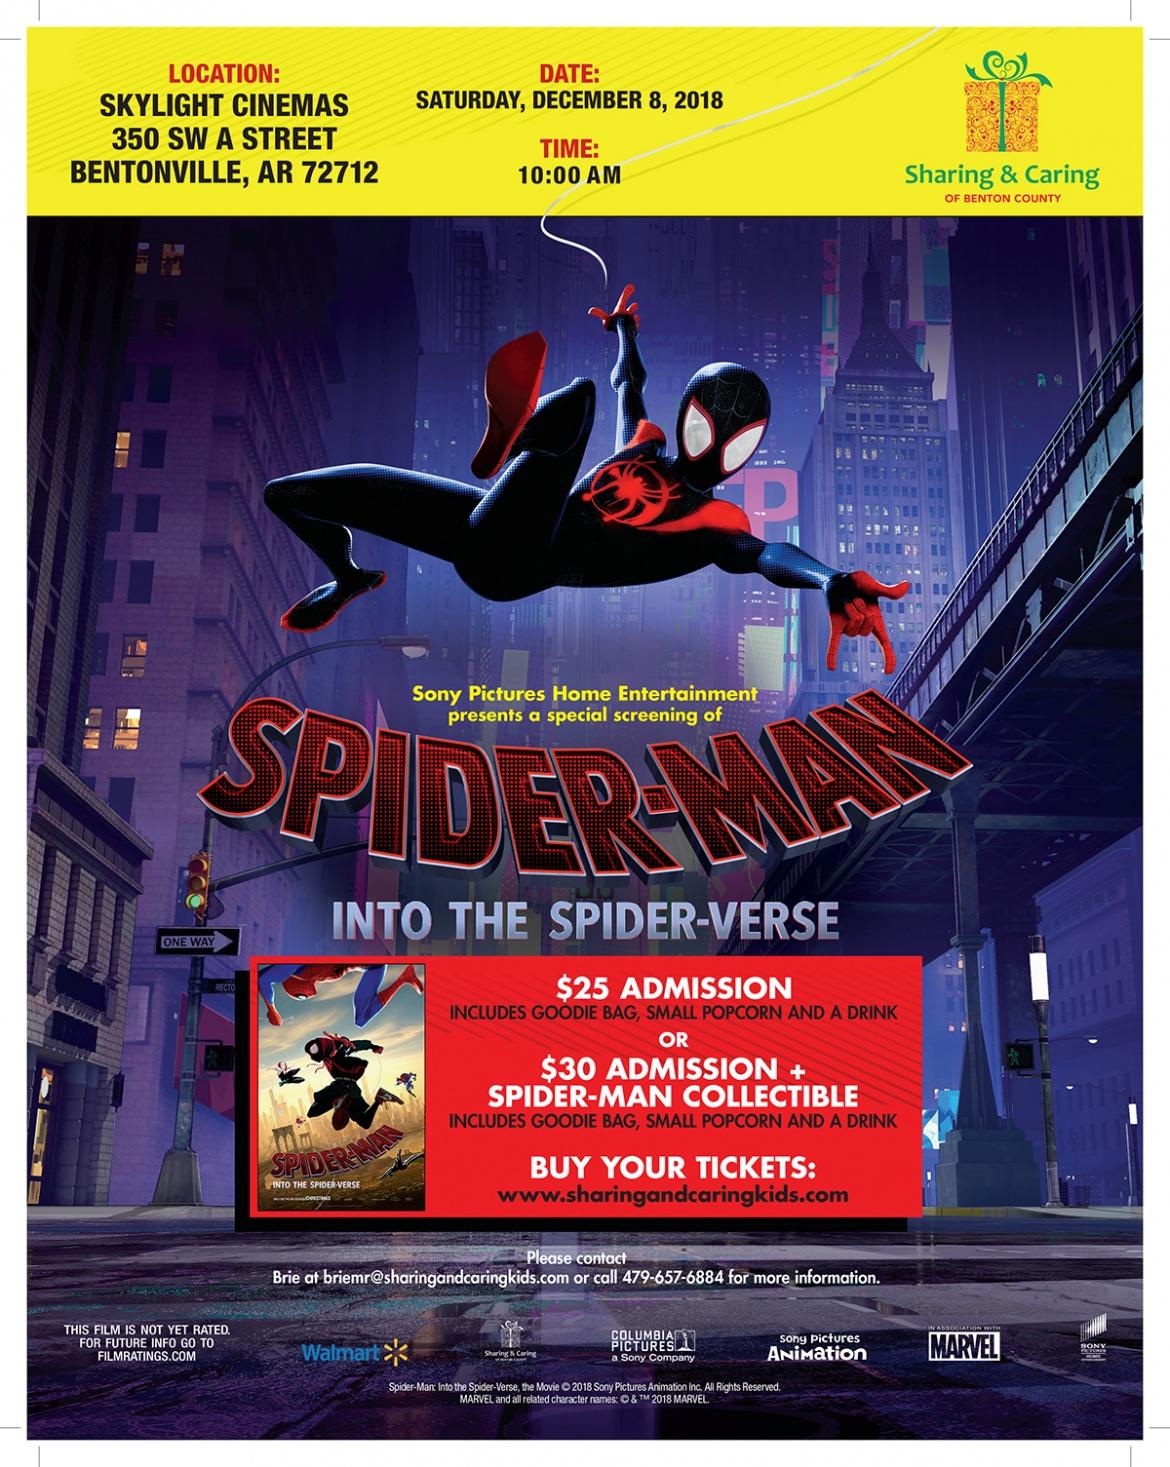 SPIDERMAN_SPIDERVERSE-Poster.jpg